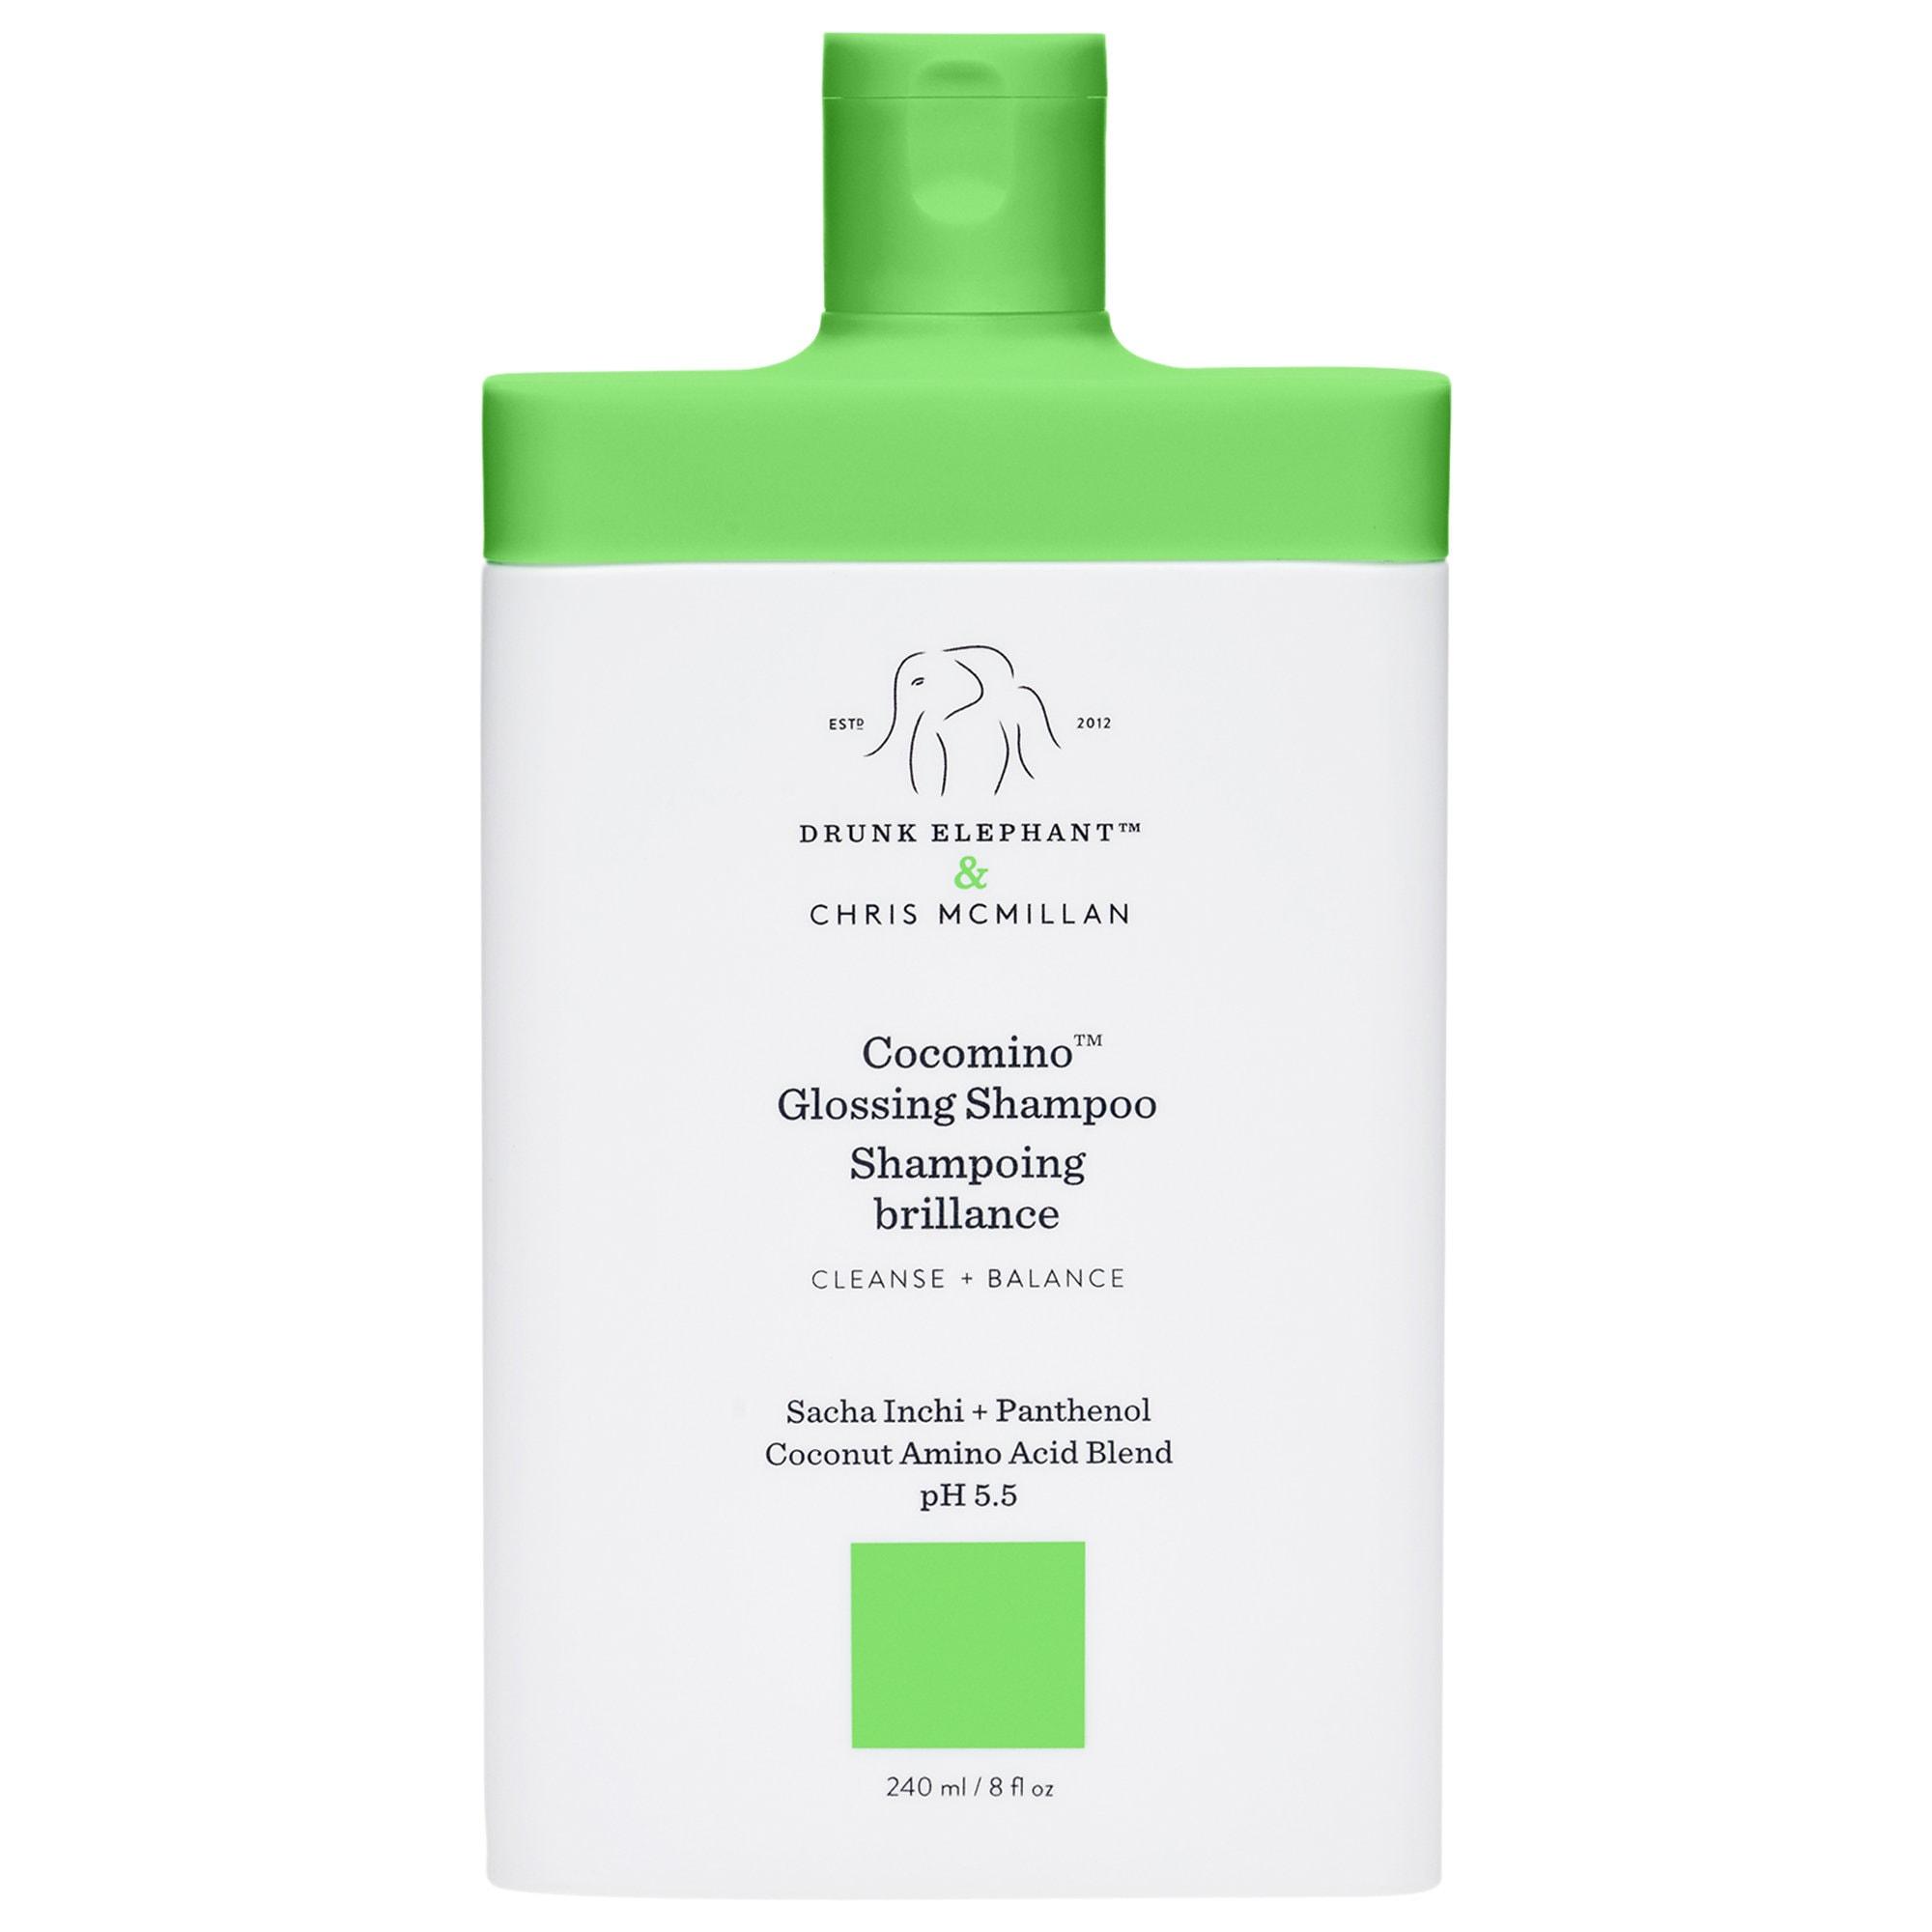 Drunk Elephant - Cocomino™ Glossing Shampoo